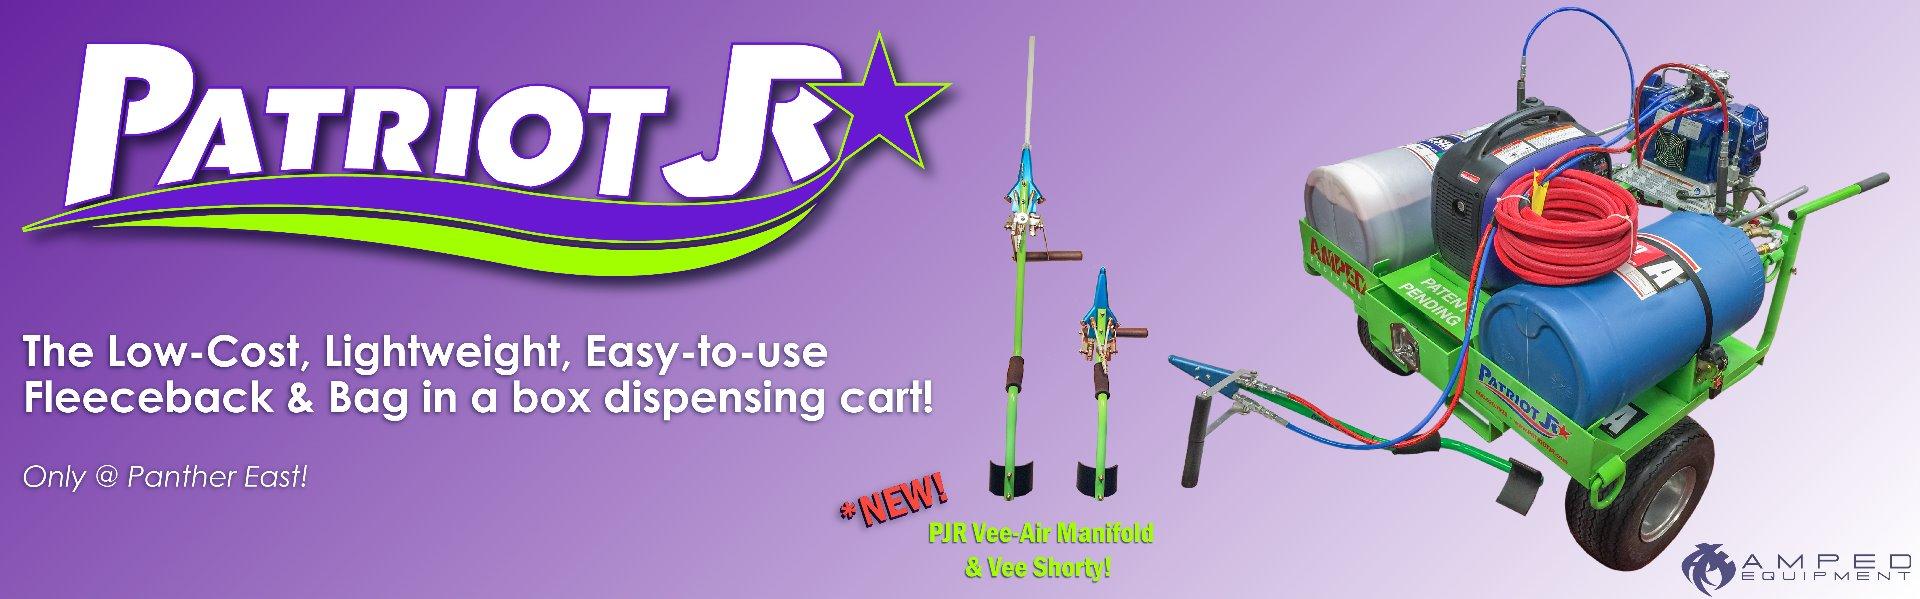 The Patriot Junior / PJR, Mobile Spray Foam Cart